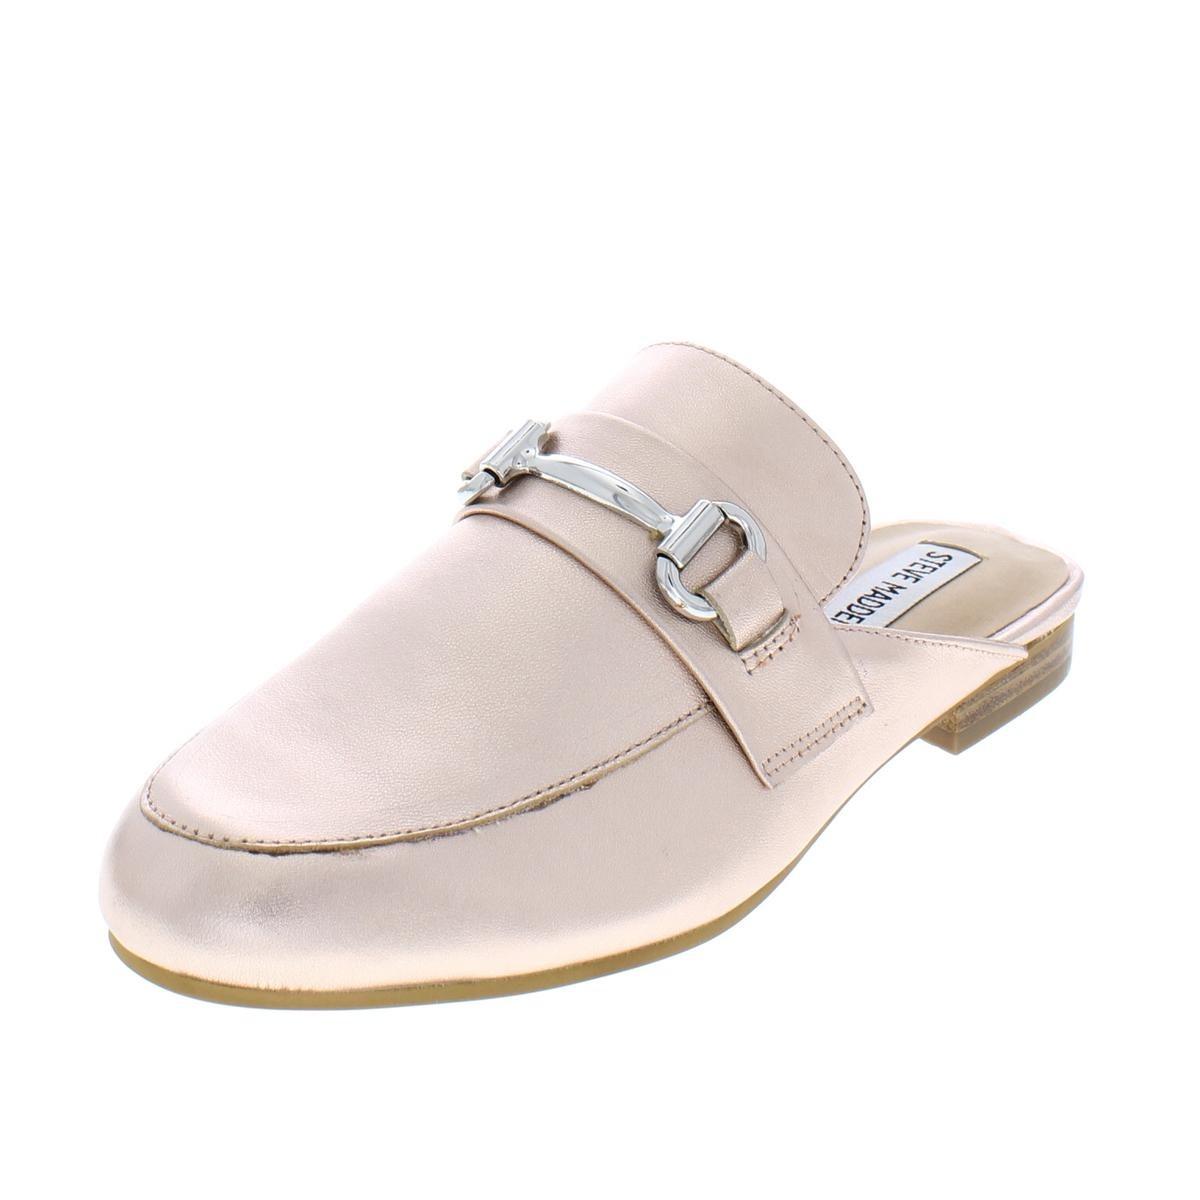 A Zapatos Para Mulas Medida Steve De Mujer Bhfo Madden Kandi gwxFwqIZ